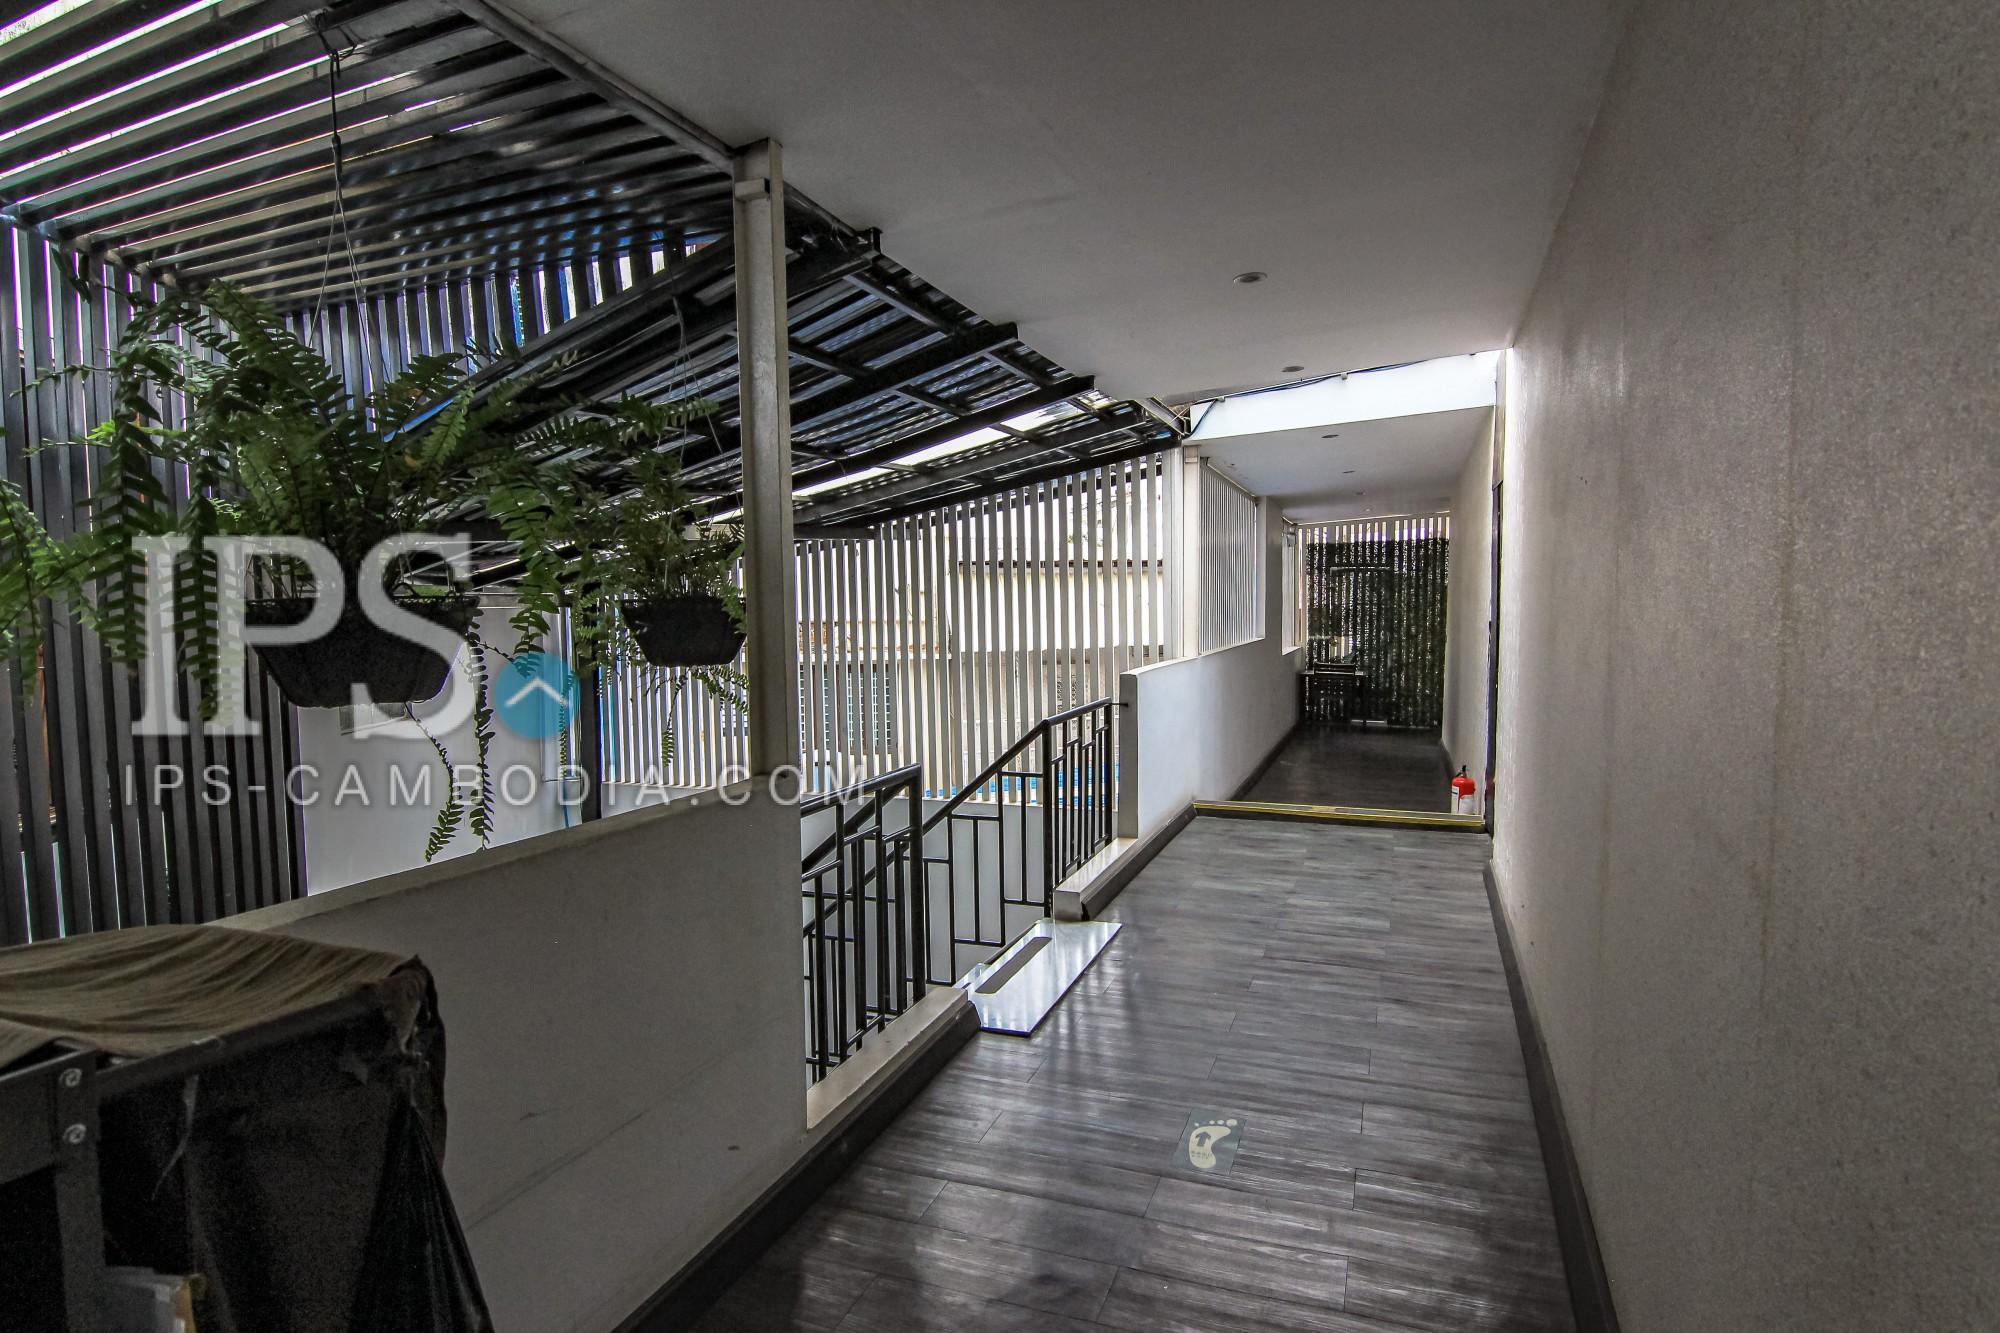 Business Hotel For Sale - Wat Phnom